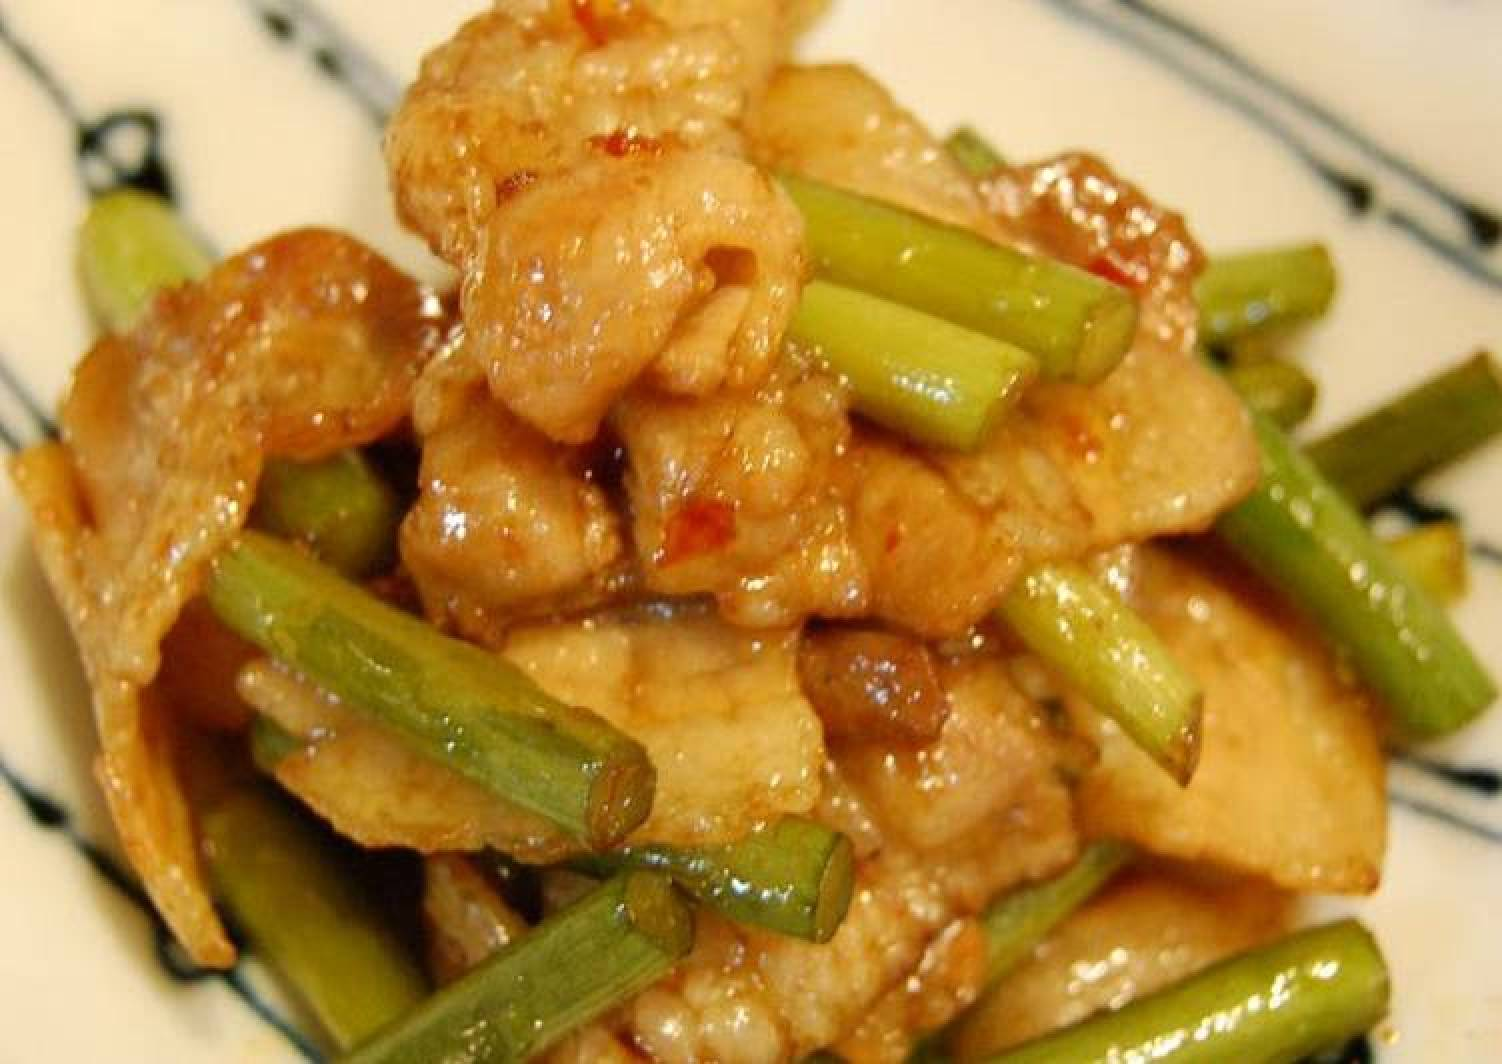 Pork Belly and Garlic Shoot Spicy Stir-Fry